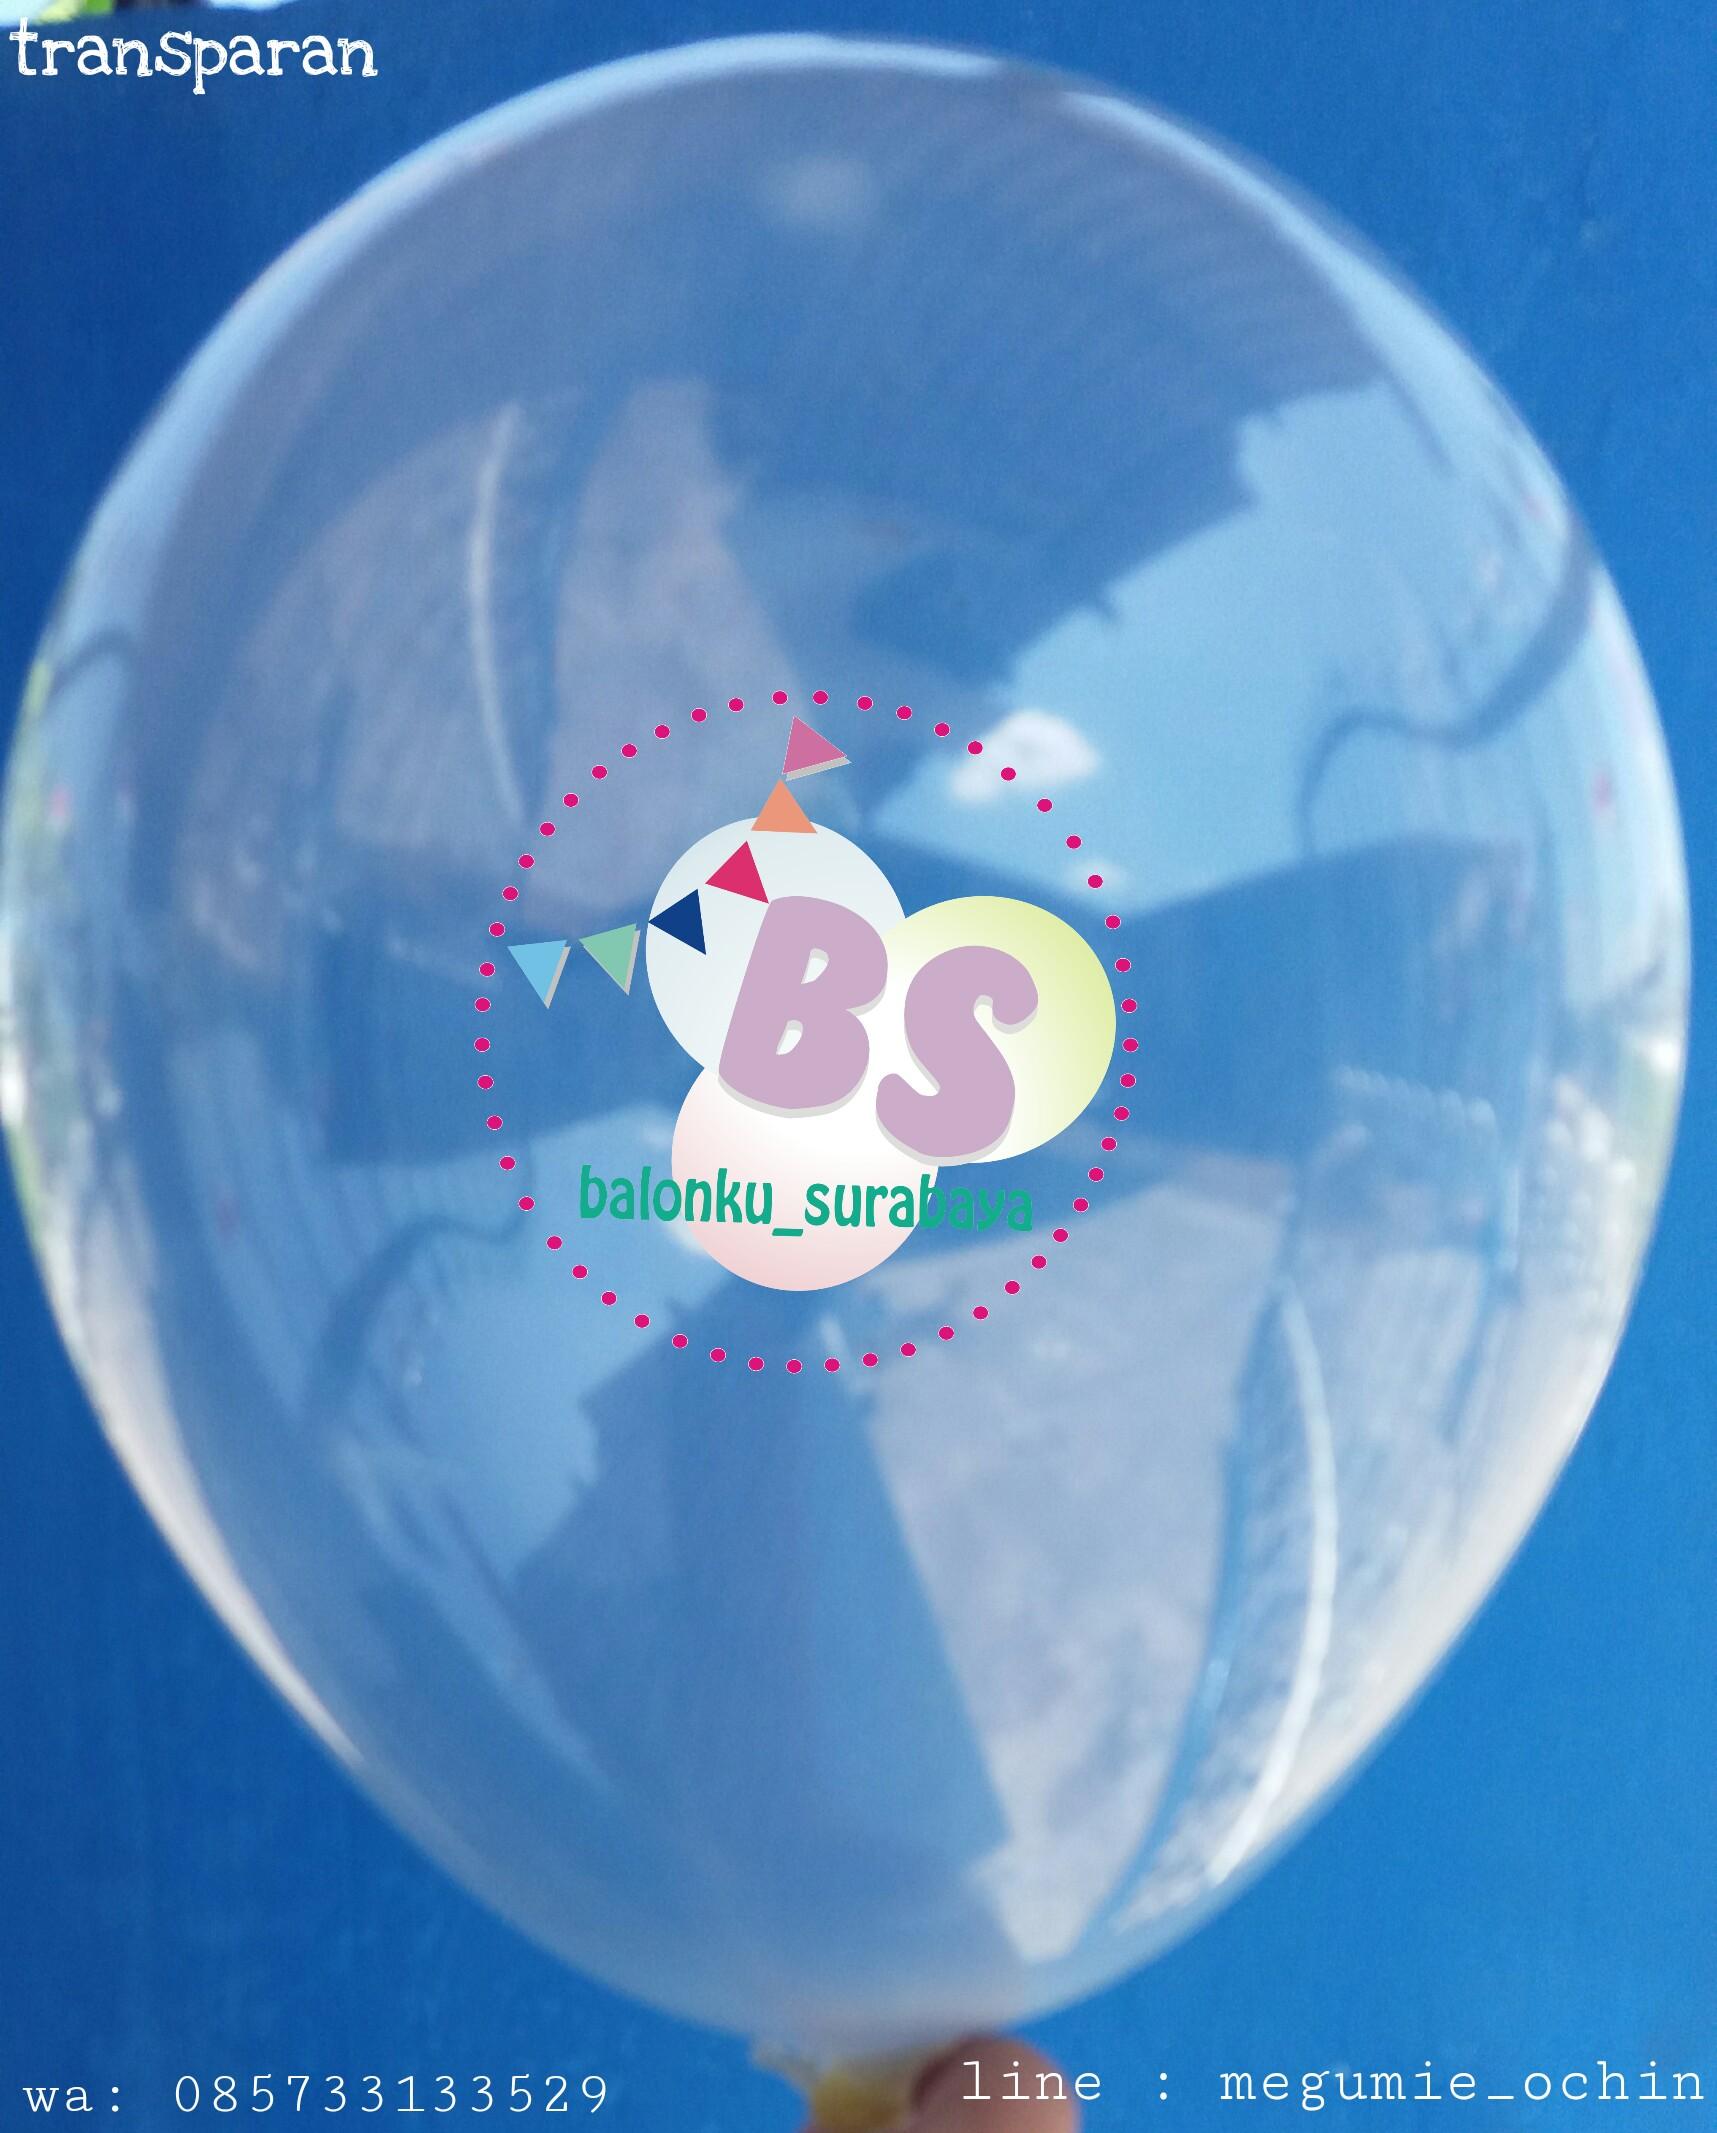 balon transparan, balon doff, balon latex doff, balon ulang tahun, balon dekorasi, balon foil, balon metalik, balon twist, balon latex, balon huruf, balon angka, supplier balon, dekorasi balon, sablon balon, confetti, bendera ulang tahun, balon LED, lampion terbang